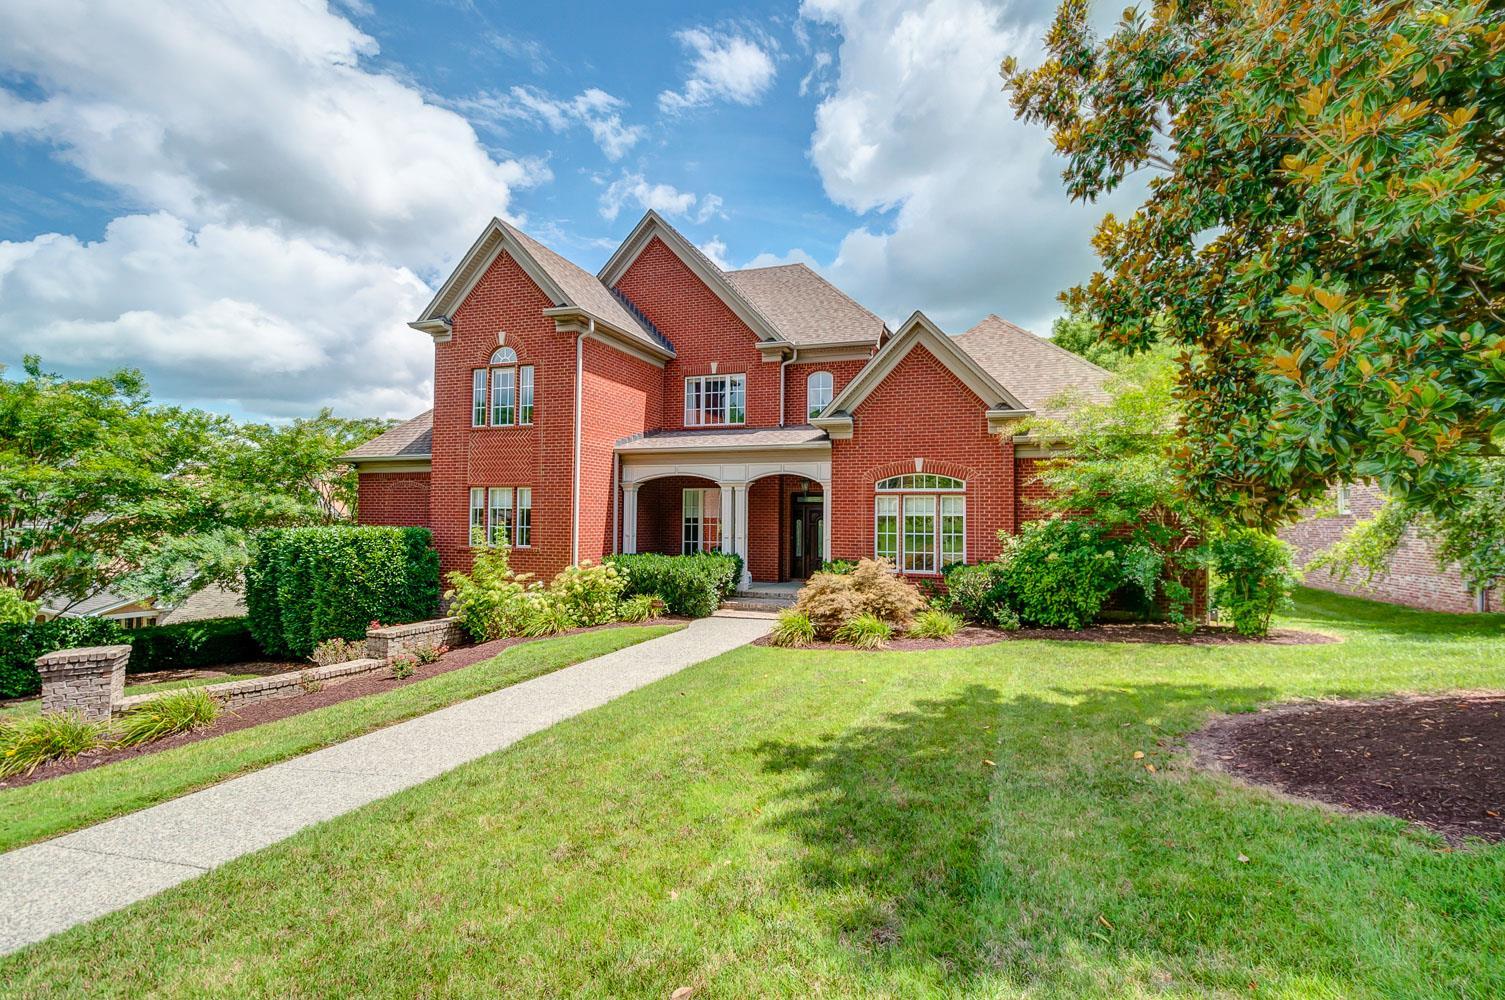 476 Sandcastle Road, Franklin, TN 37069 - Franklin, TN real estate listing